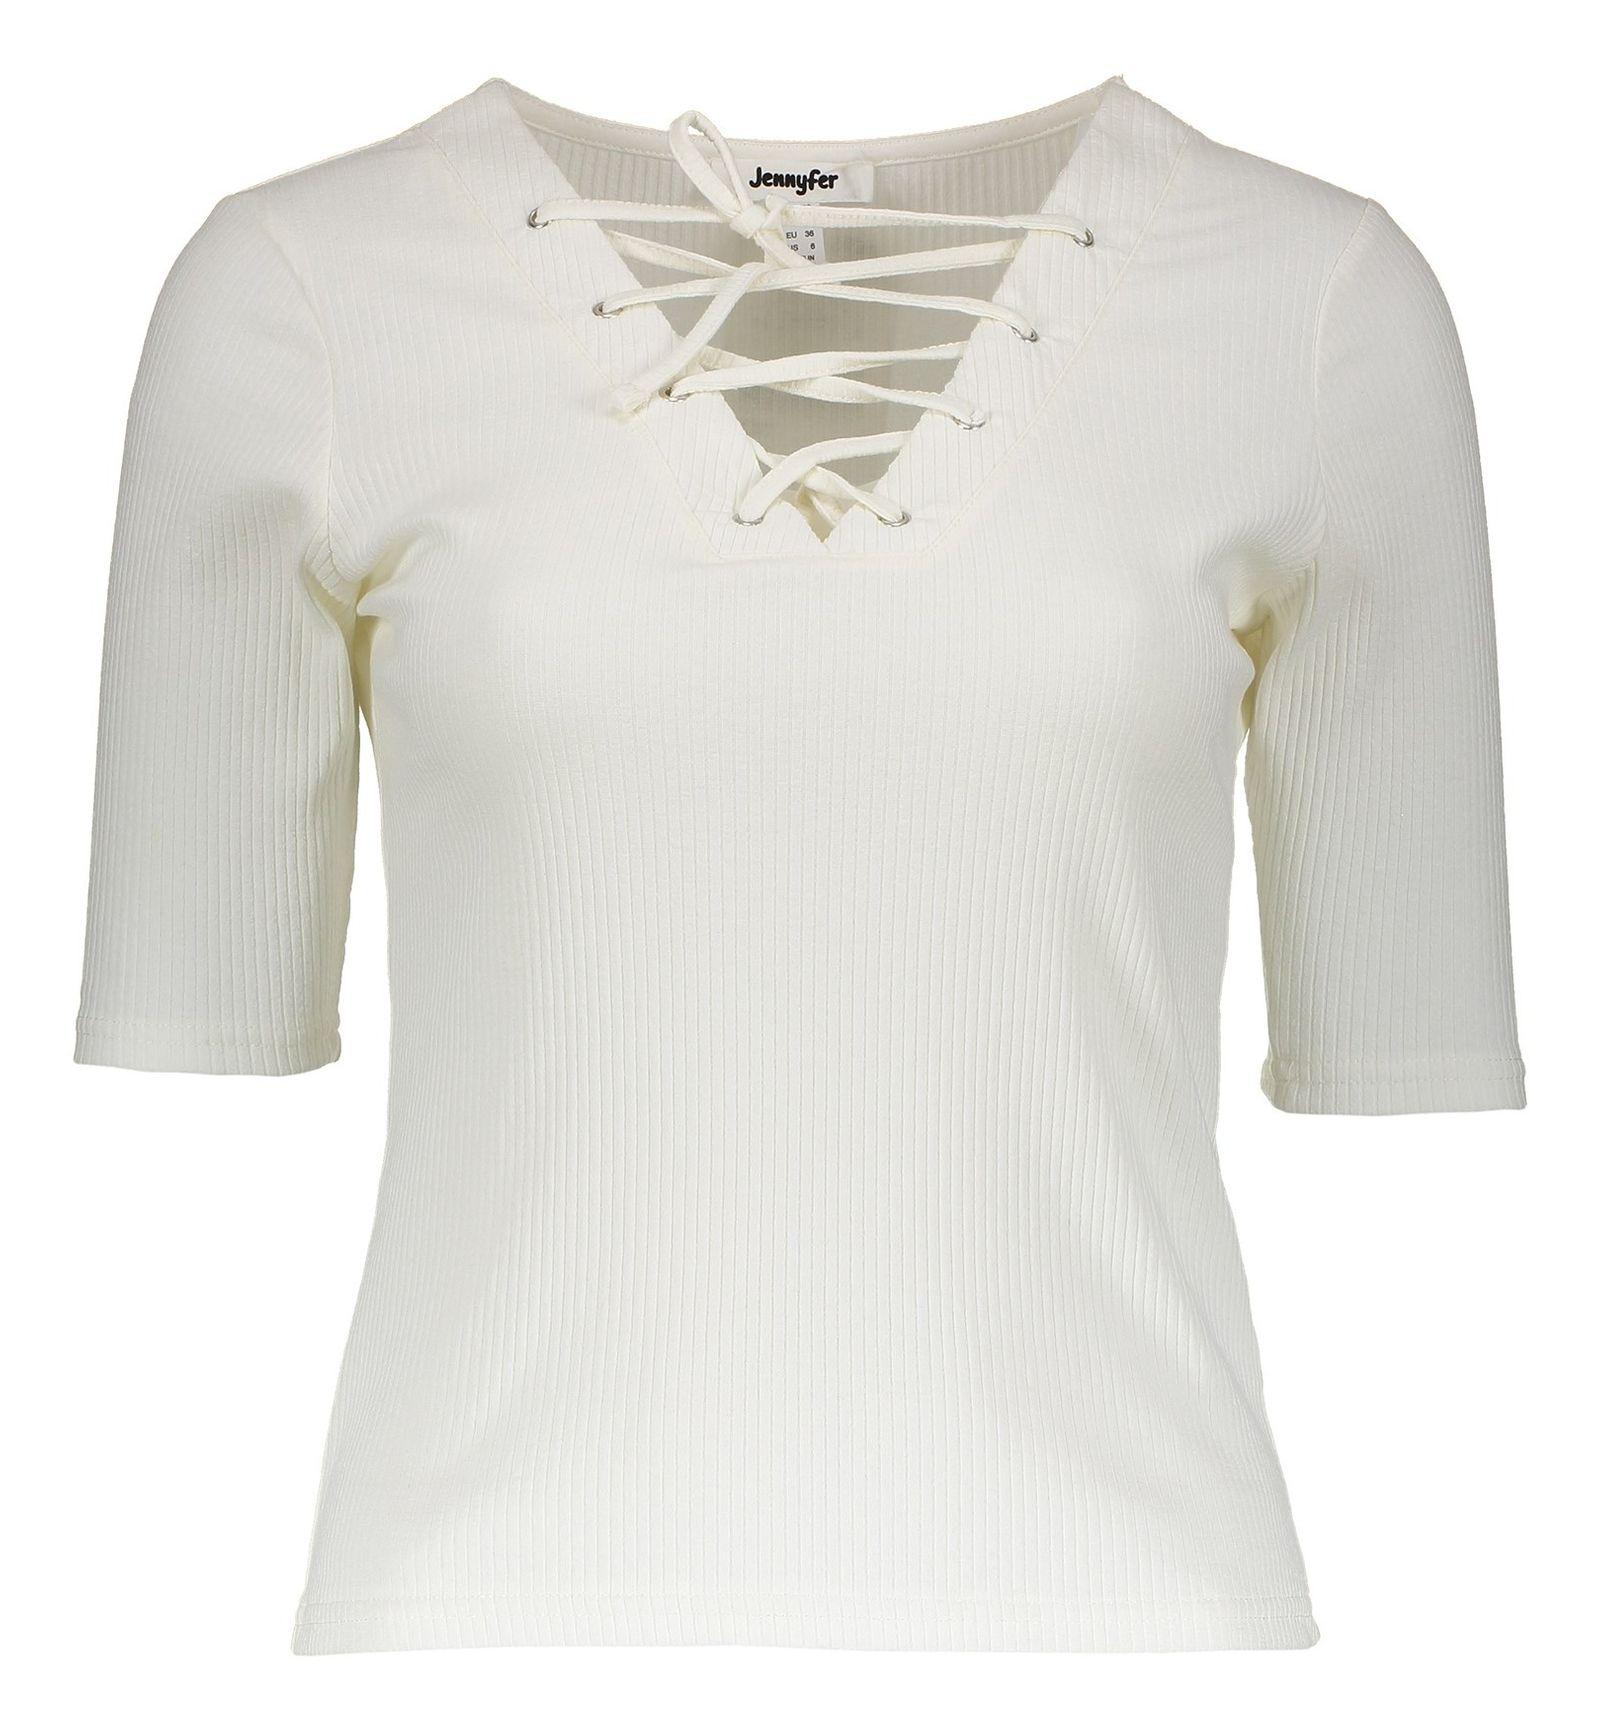 تی شرت نخی زنانه - جنیفر - سفيد - 1